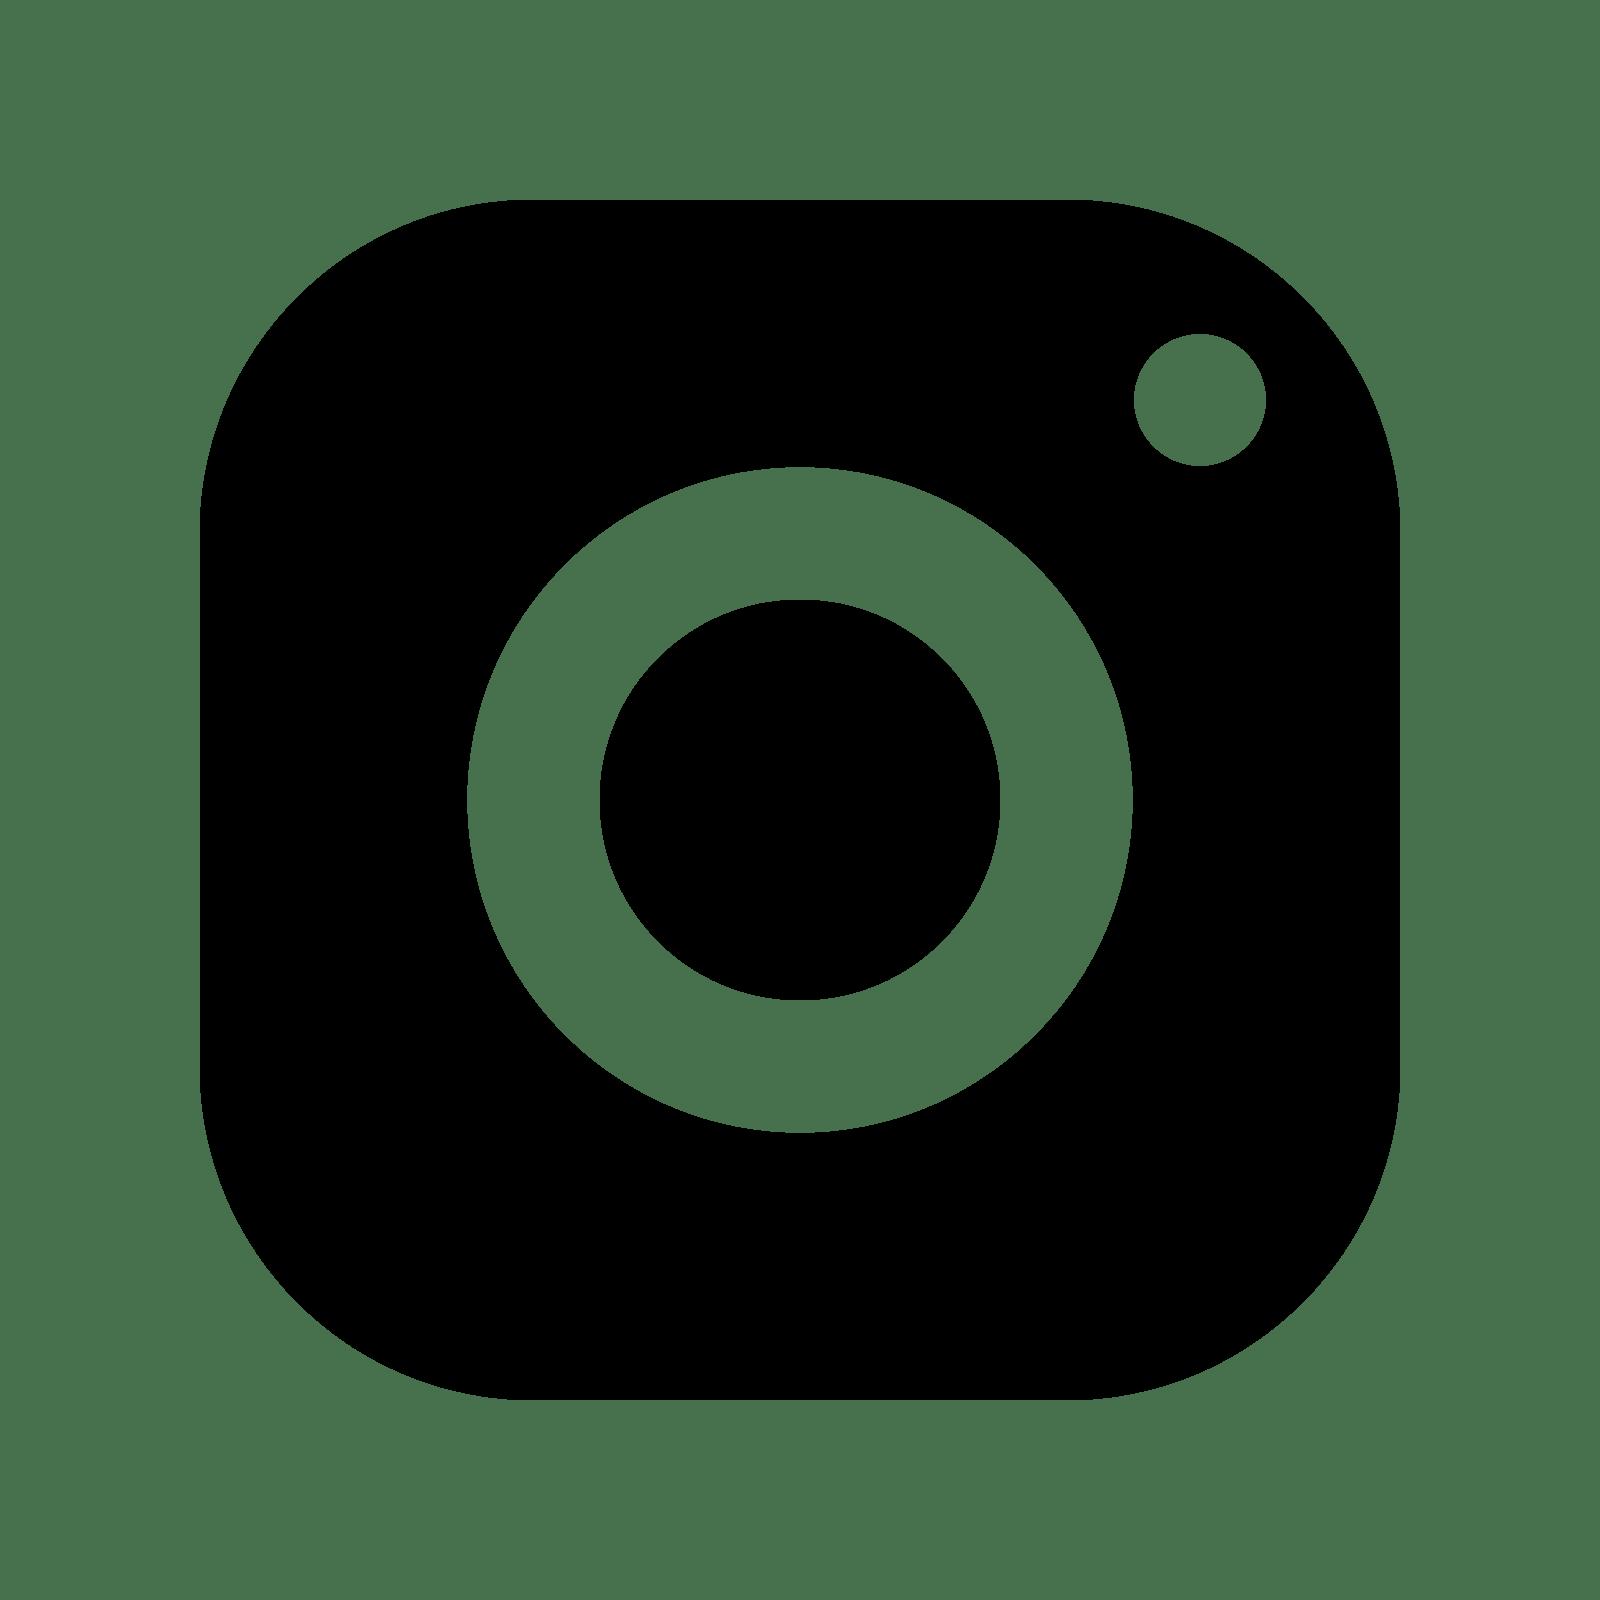 1600x1600 Instagram Icon Transparent Background